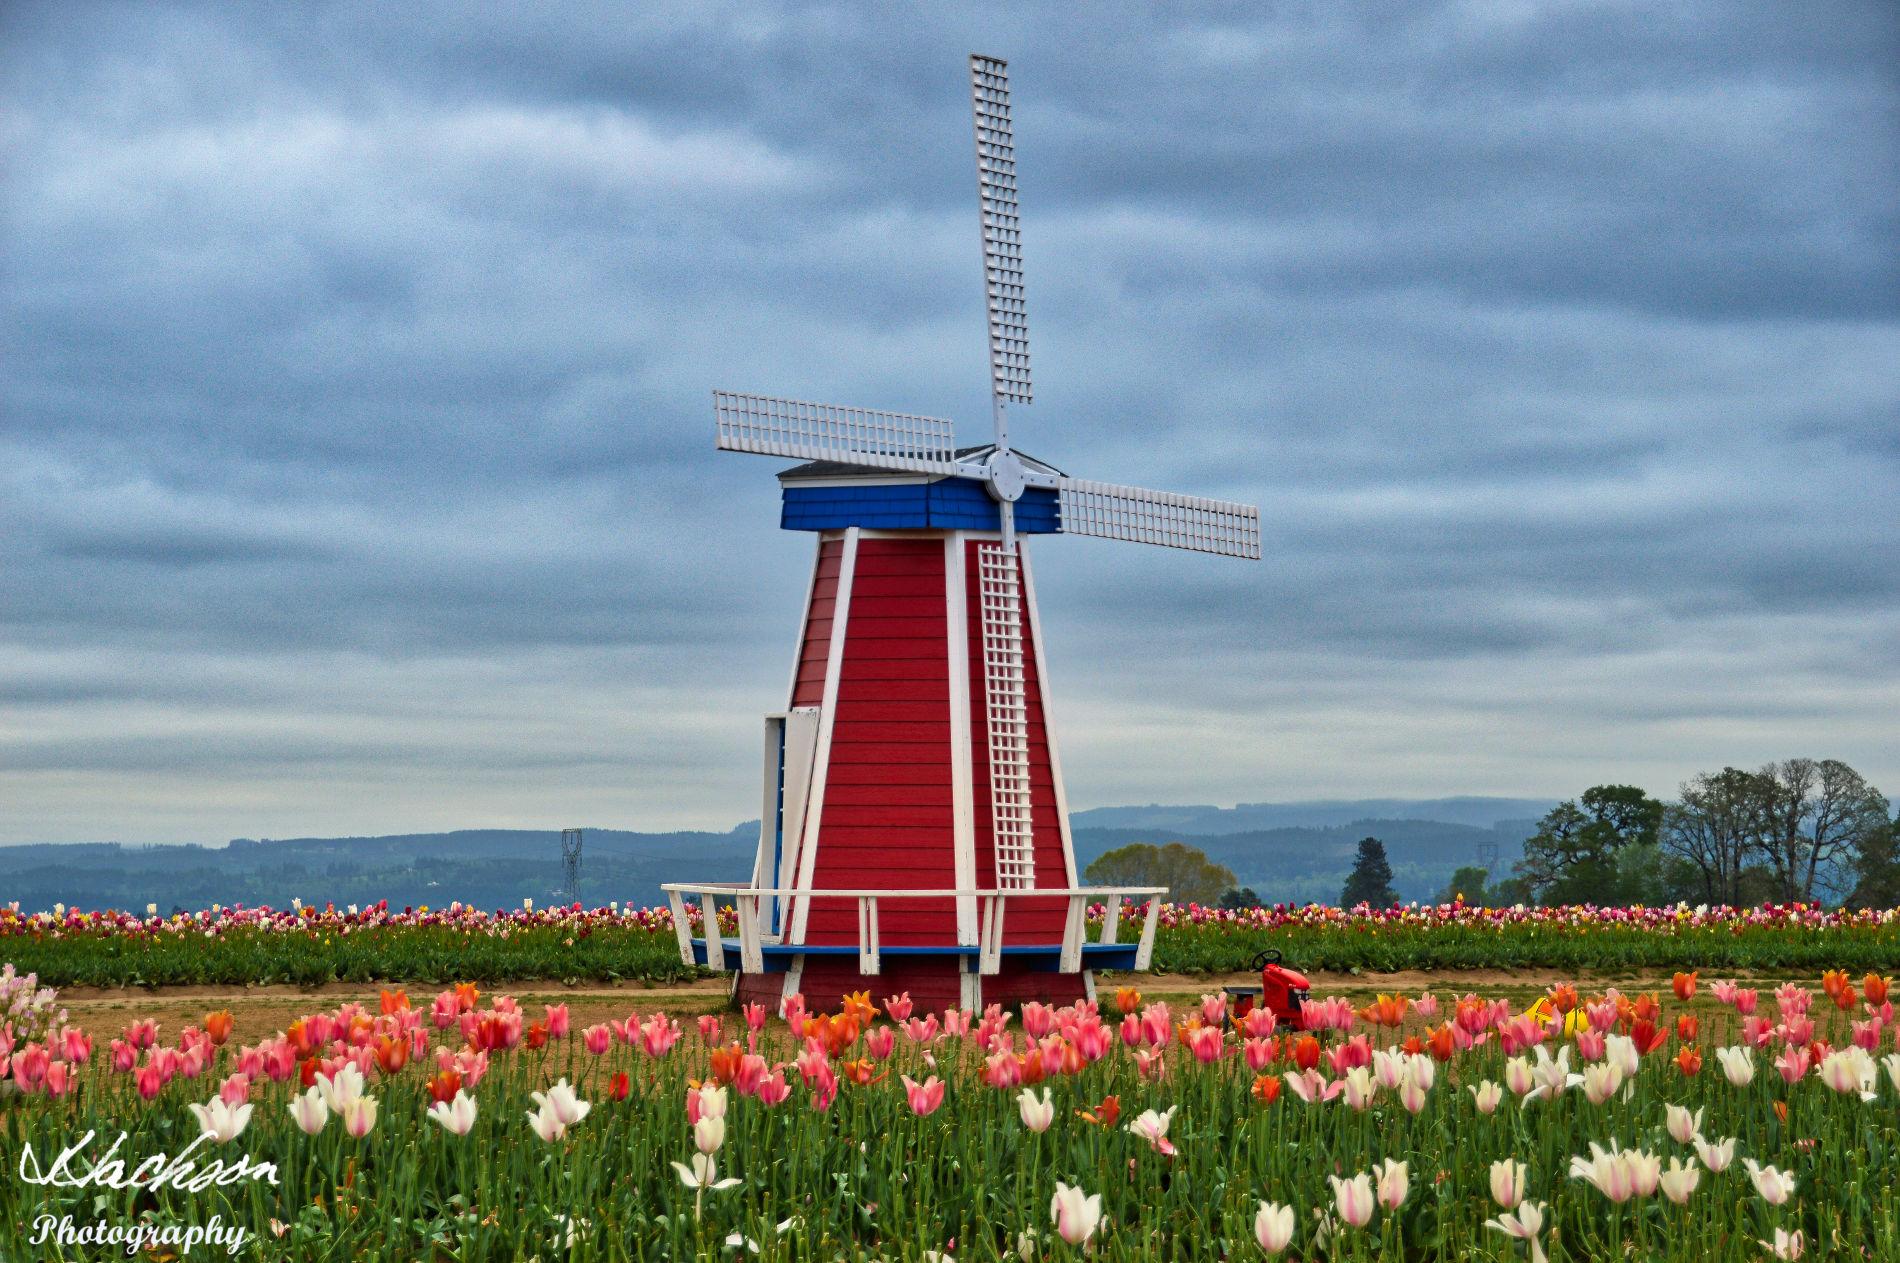 Photo of a Dutch windmill in Oregon tulip farm